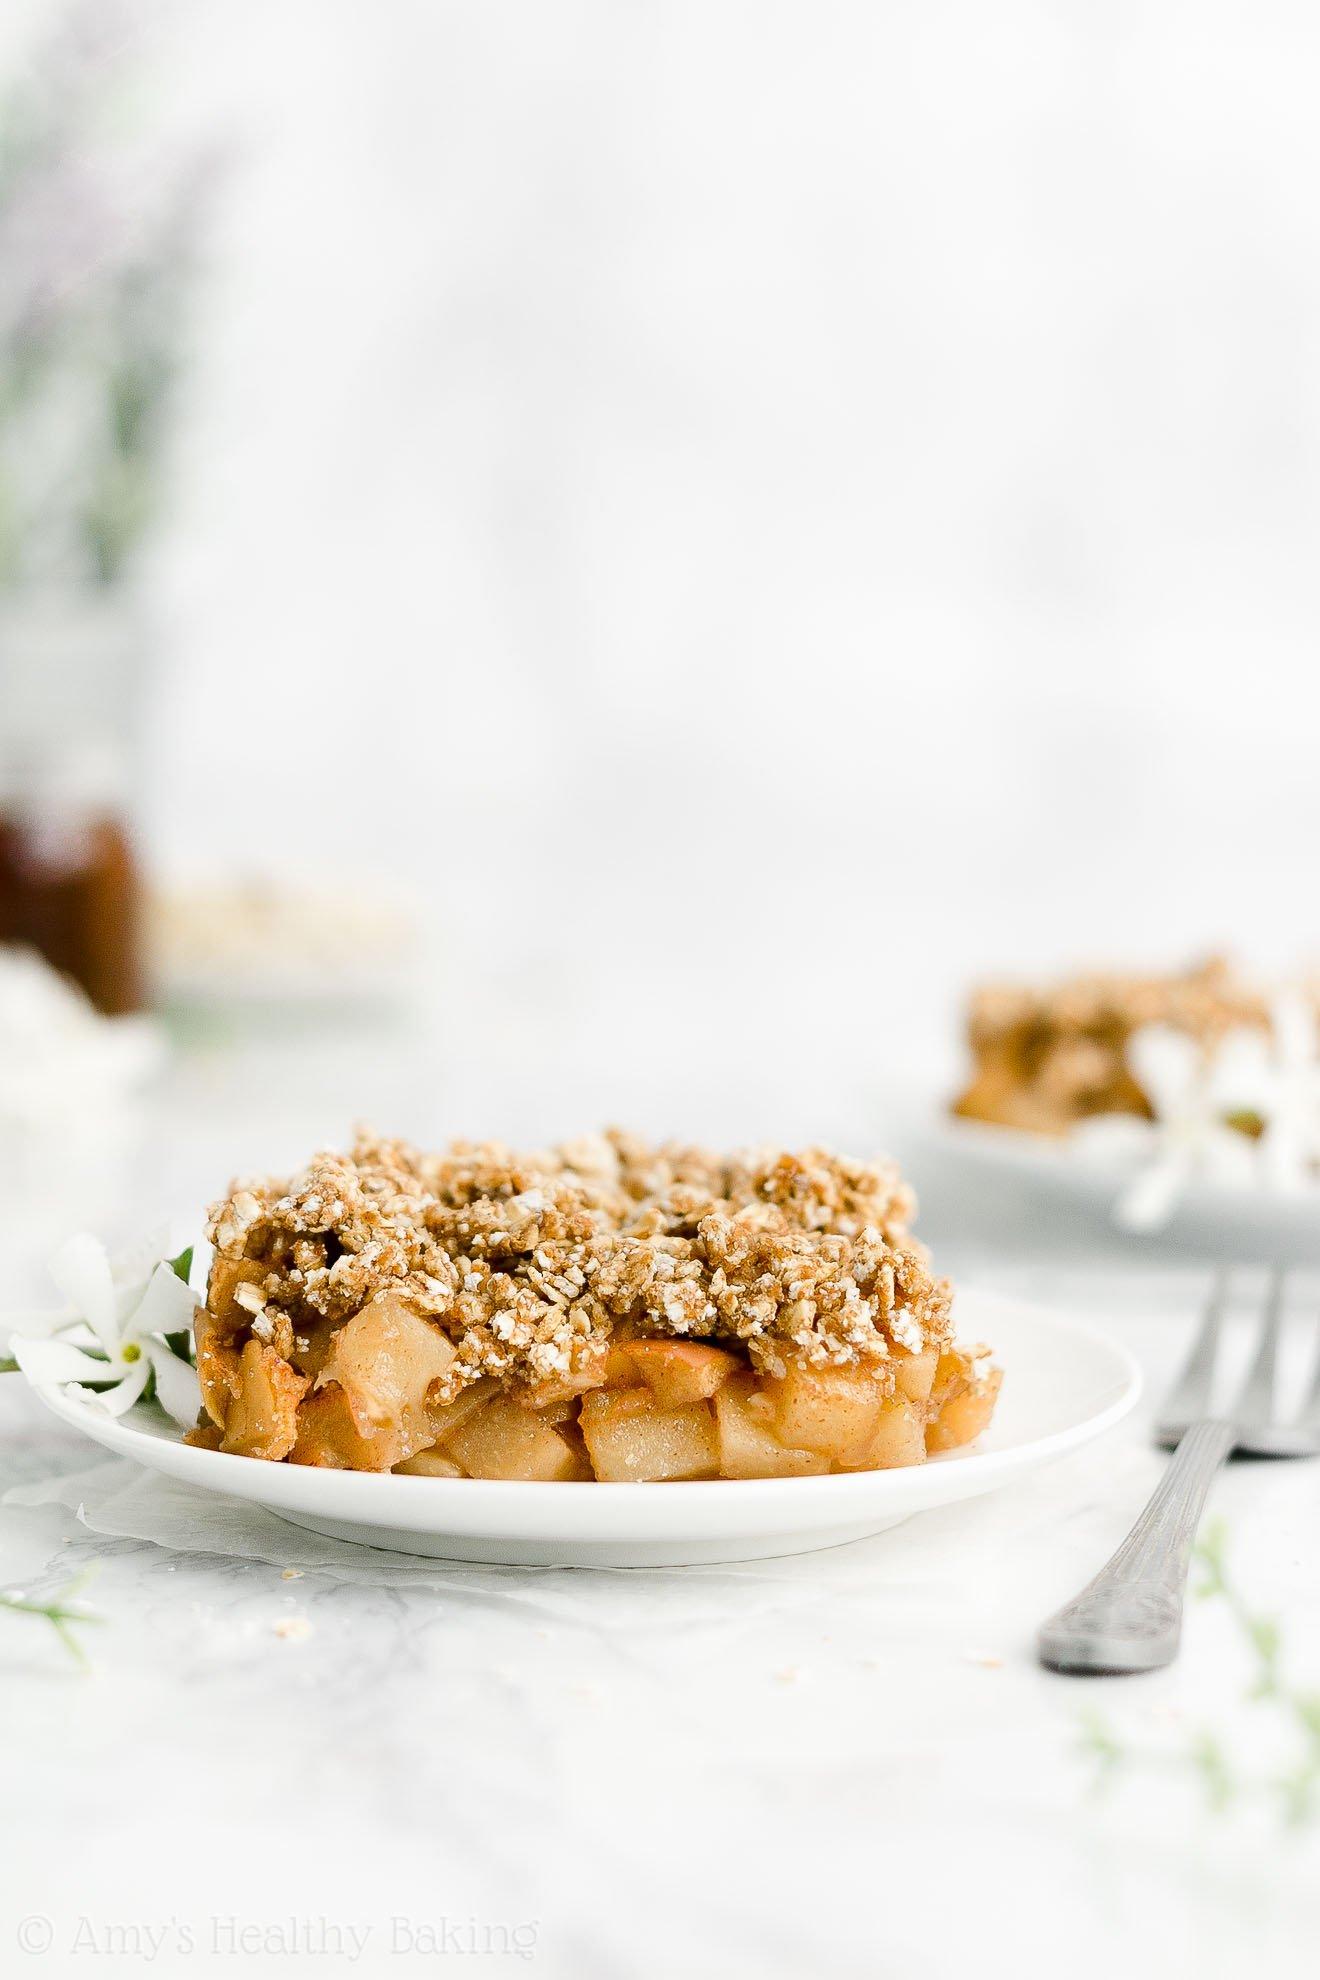 ULTIMATE Best Ever Easy Healthy No Sugar Low Calorie Vegan Classic Apple Crisp